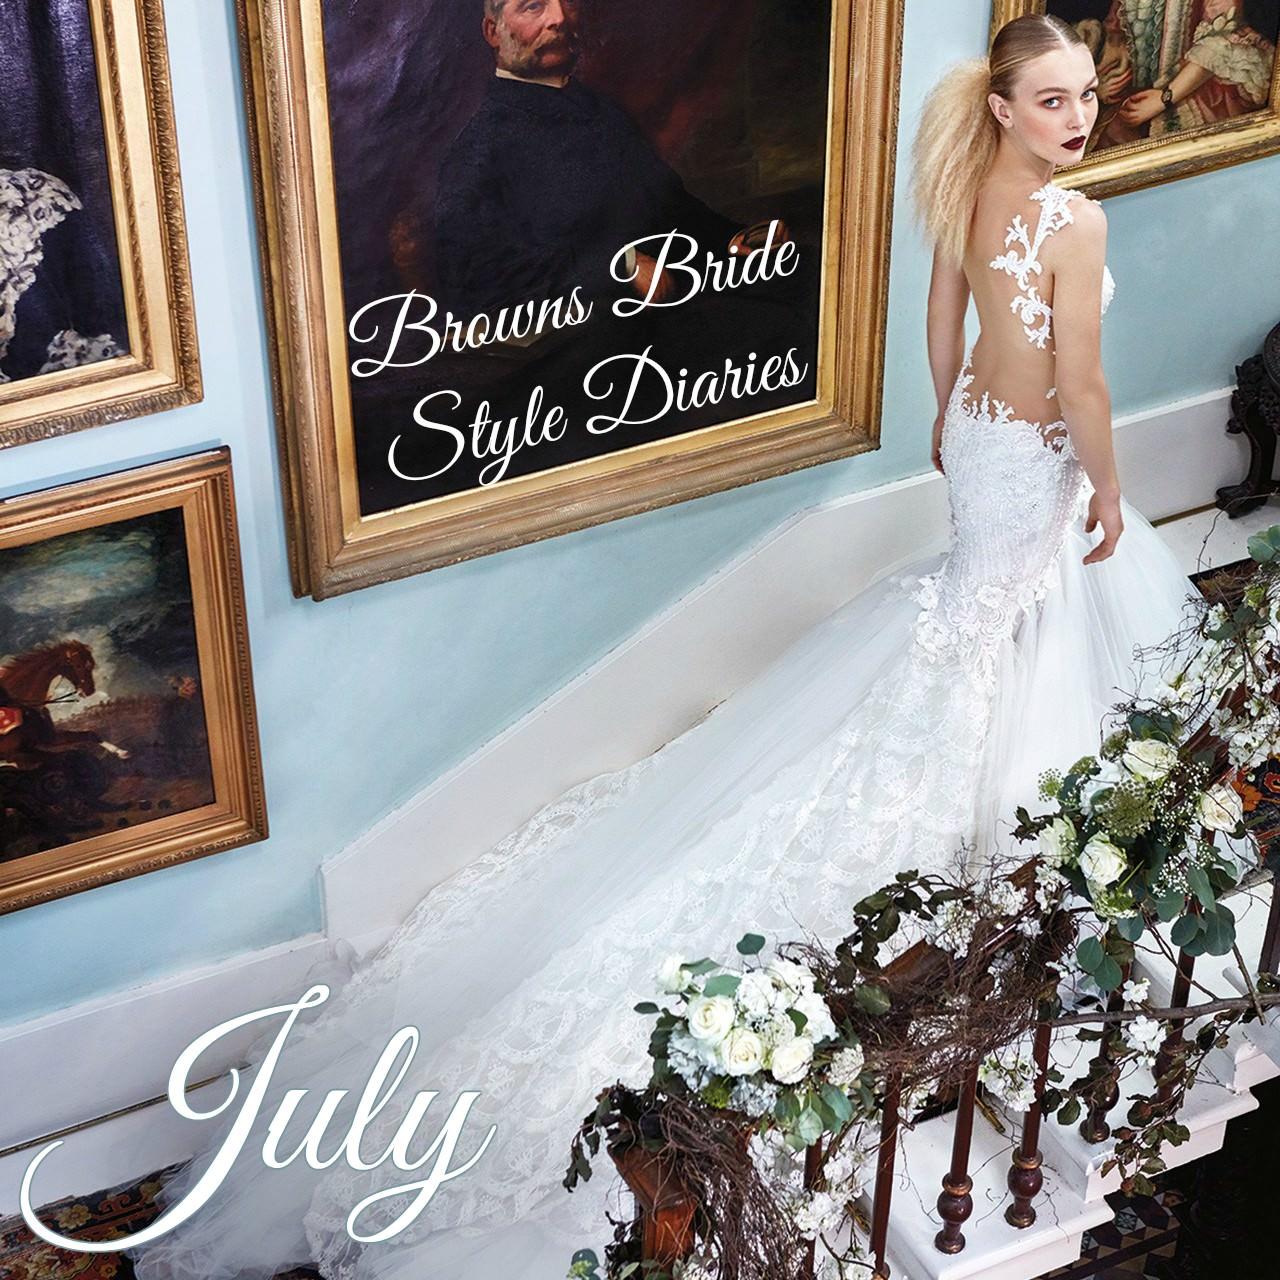 BROWNS BRIDE STYLE DIARIES - JULY 2017 - Browns Bride